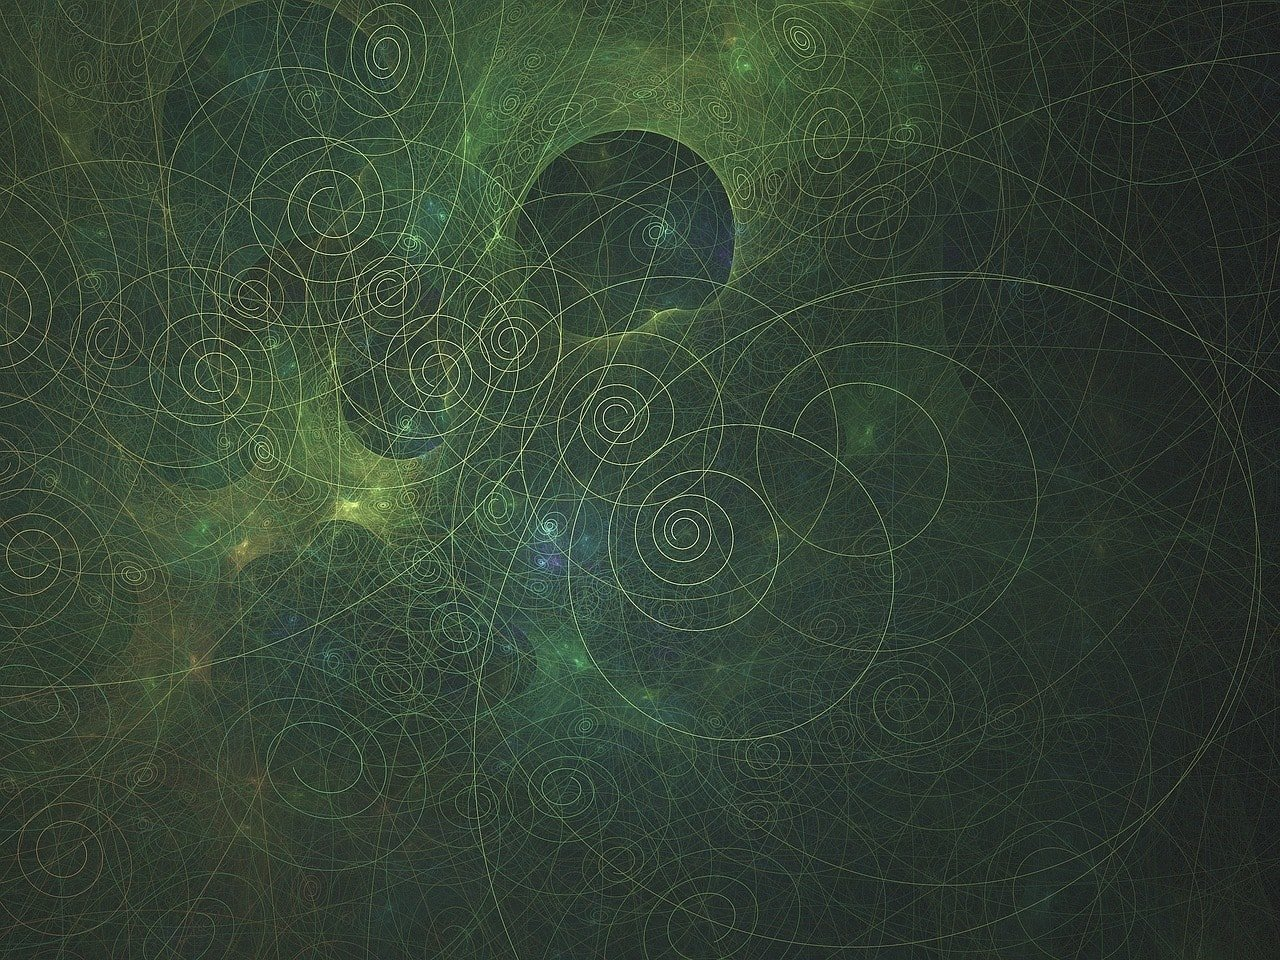 geometría sagrada fractal